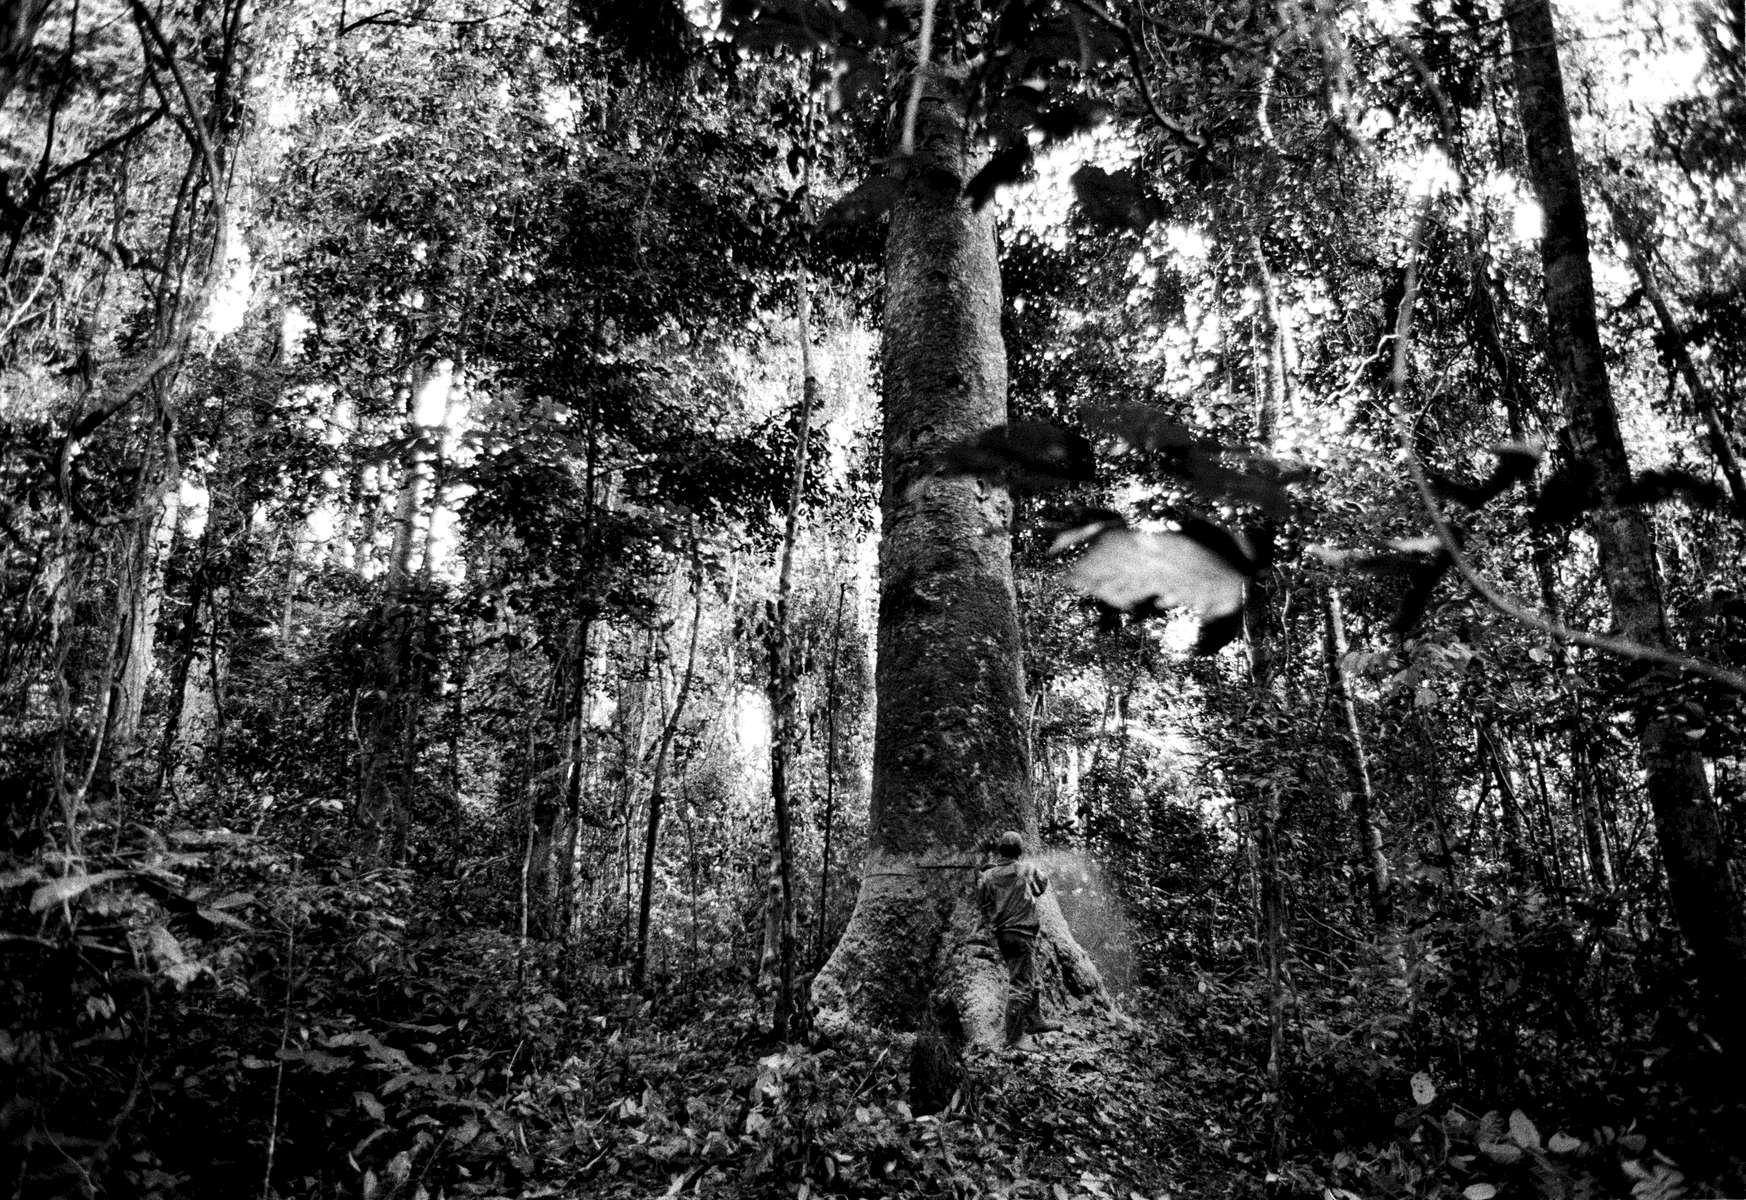 Logging in the Minkebe Reserve, Gabon 2002